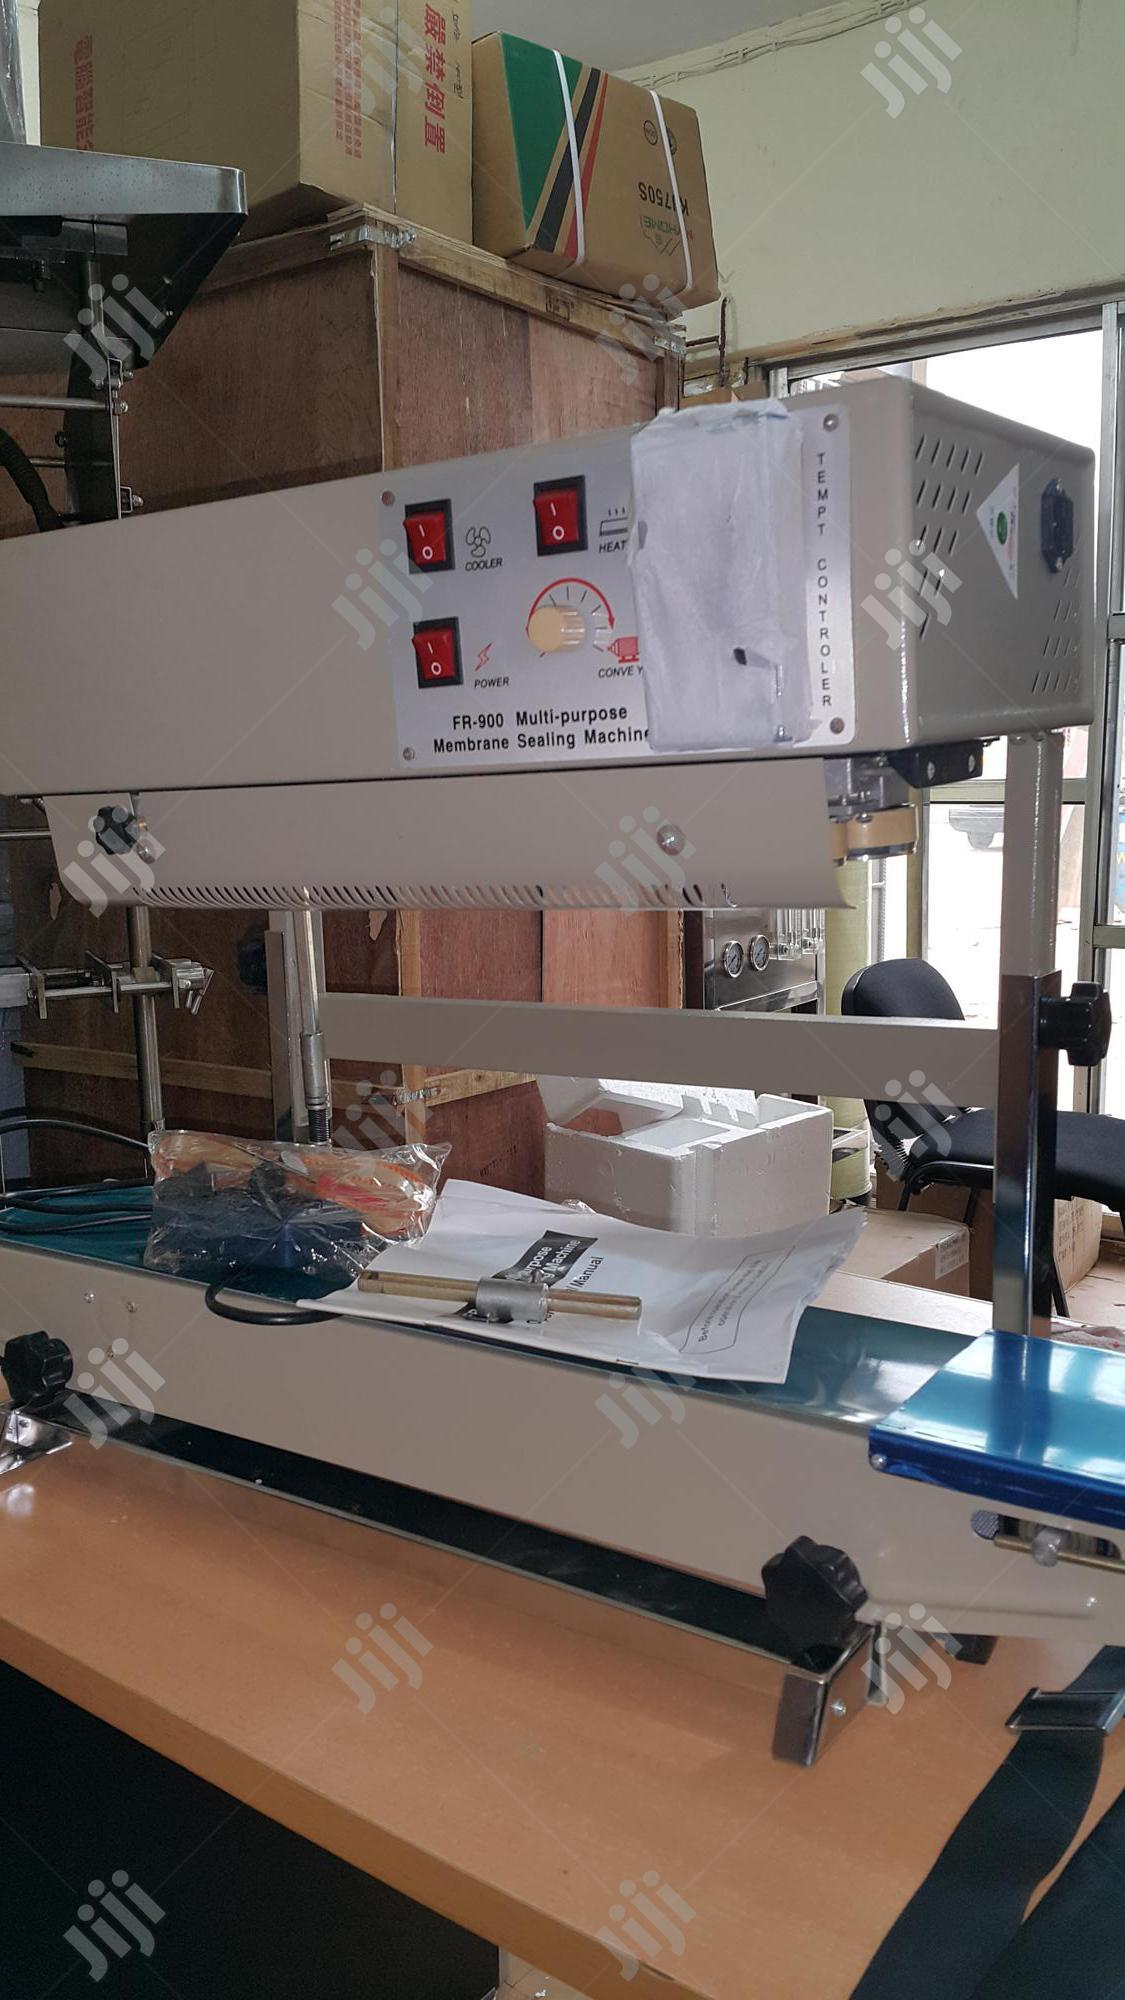 Sealing Machine Horizontal And Vertical